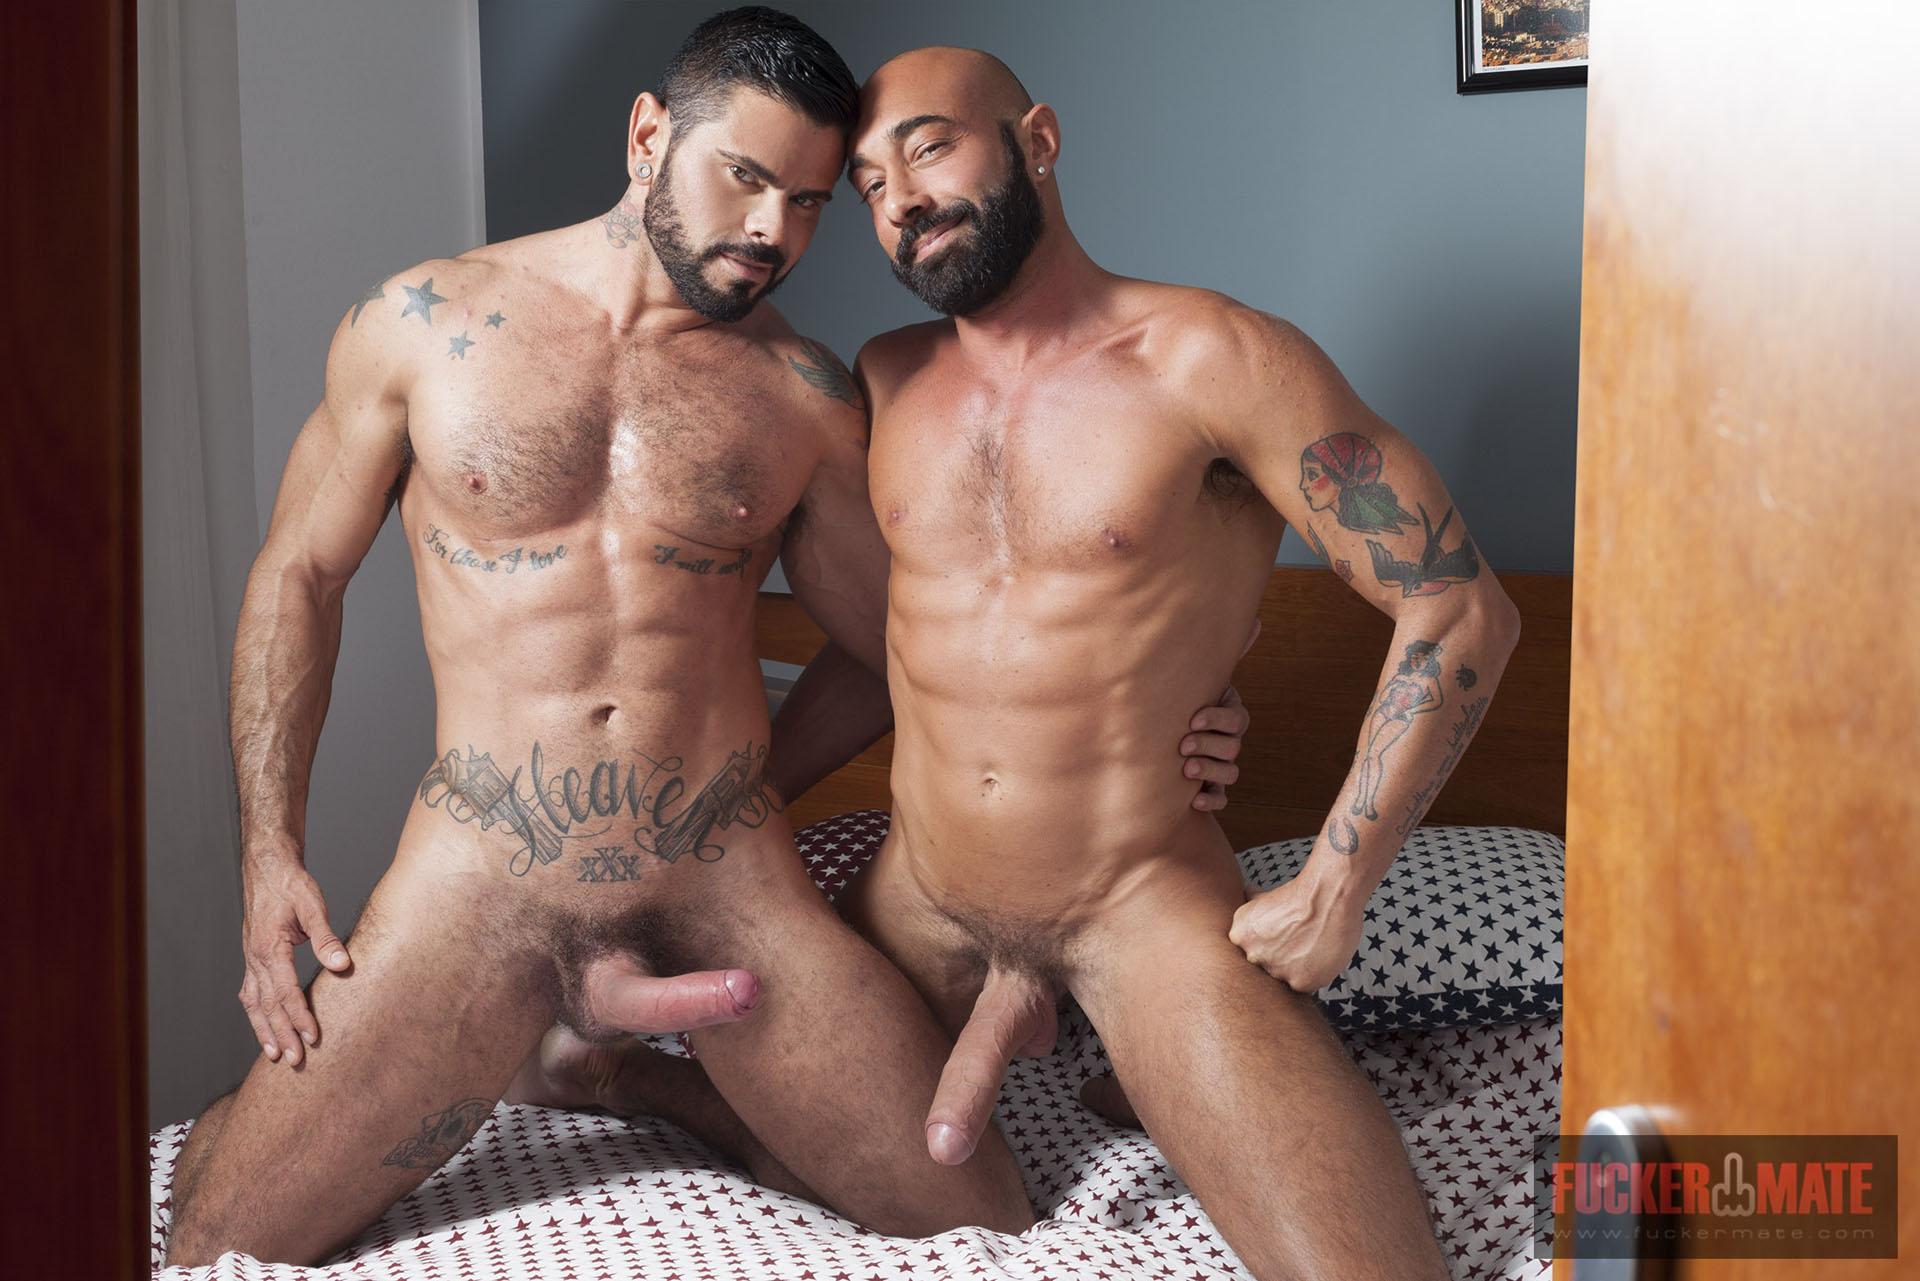 Photo of [Fucker Mate] Gianni Maggio y Mario Domenech follada sin condón entre vecinos cachondos